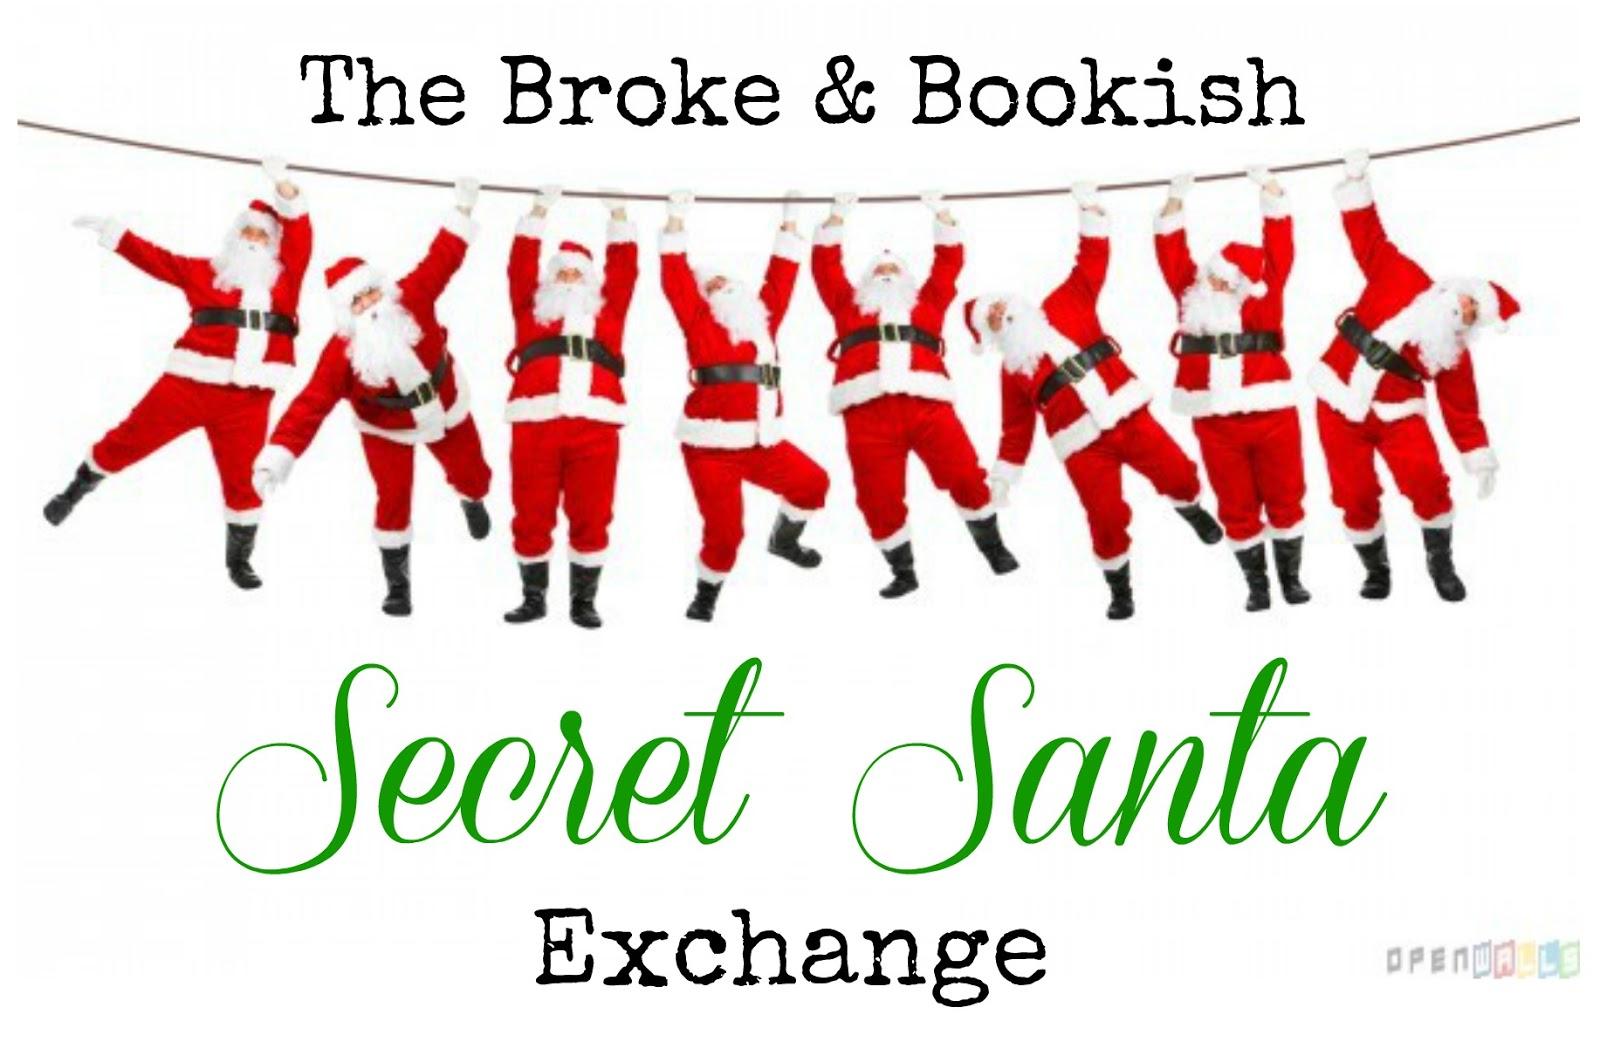 Secret Santa Images Images & Pictures - Becuo